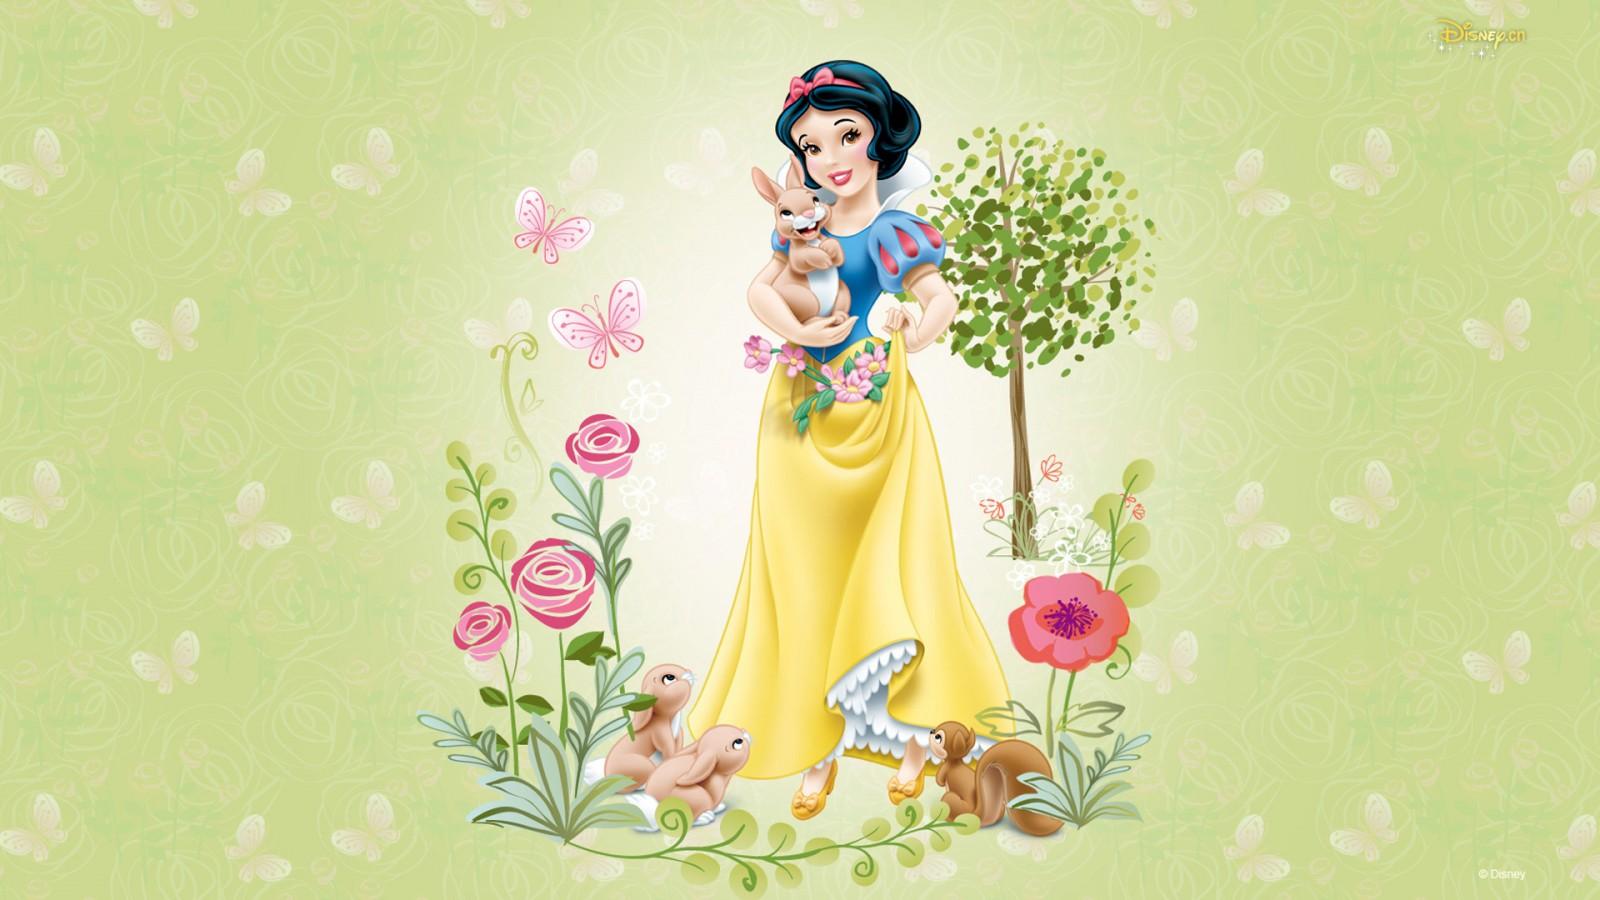 Deadpool Iphone Wallpaper Cute Disney Princess Snow White Wallpapers Hd Wallpapers Id